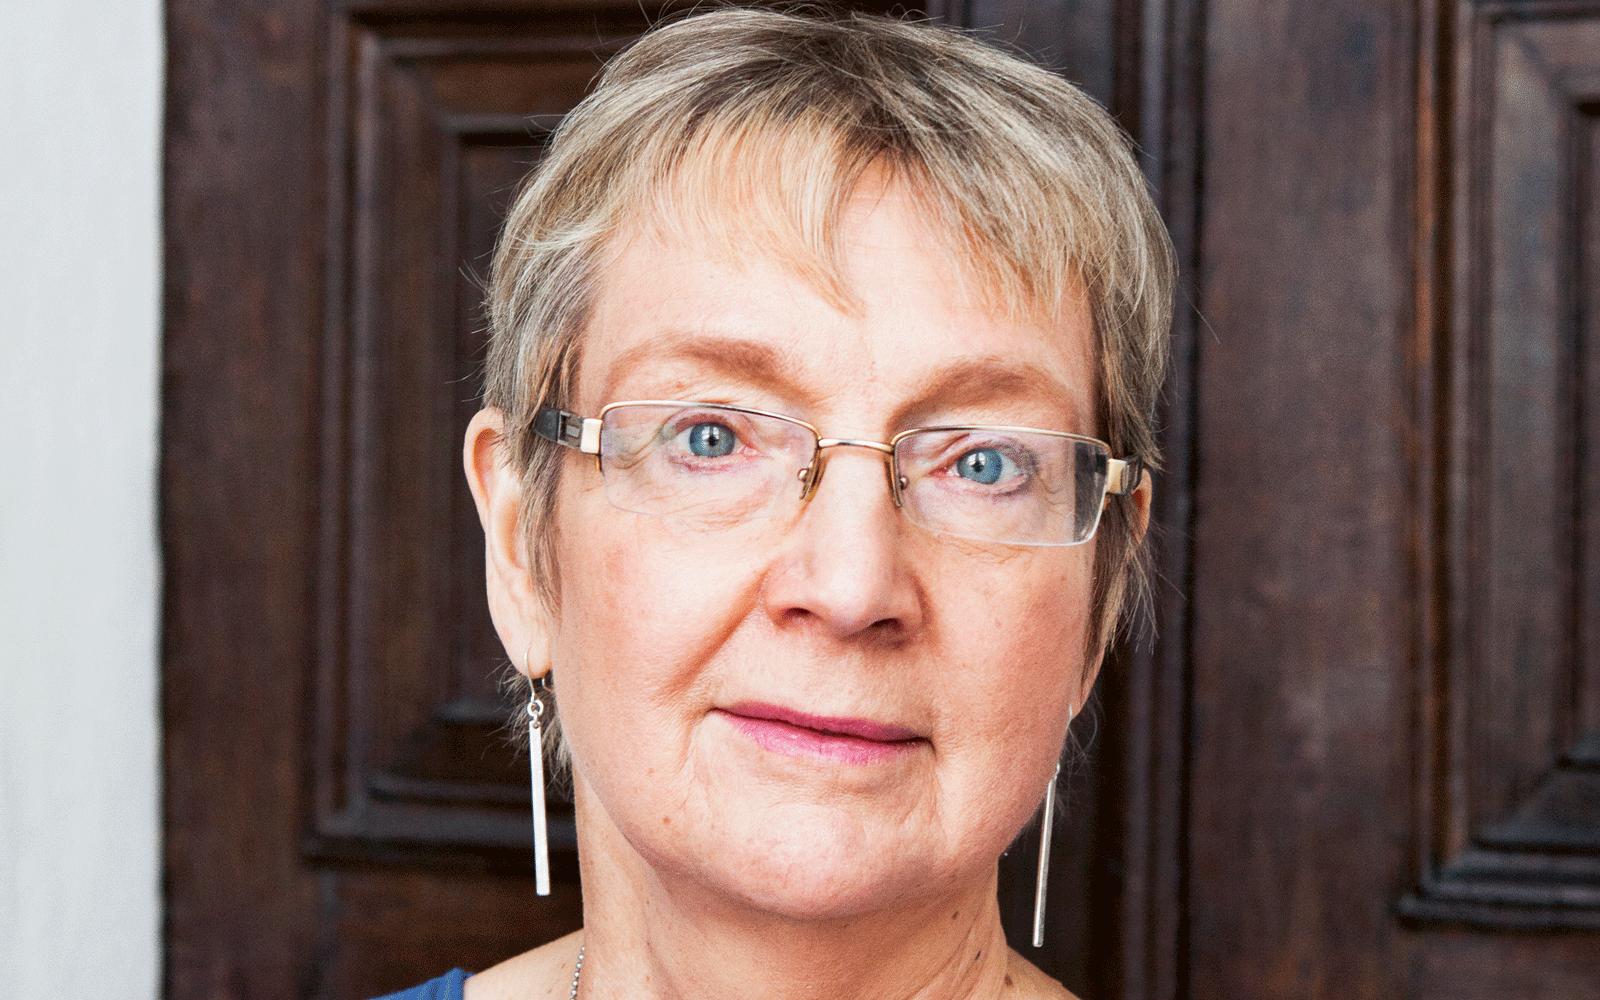 billig massage göteborg svensktalande porr